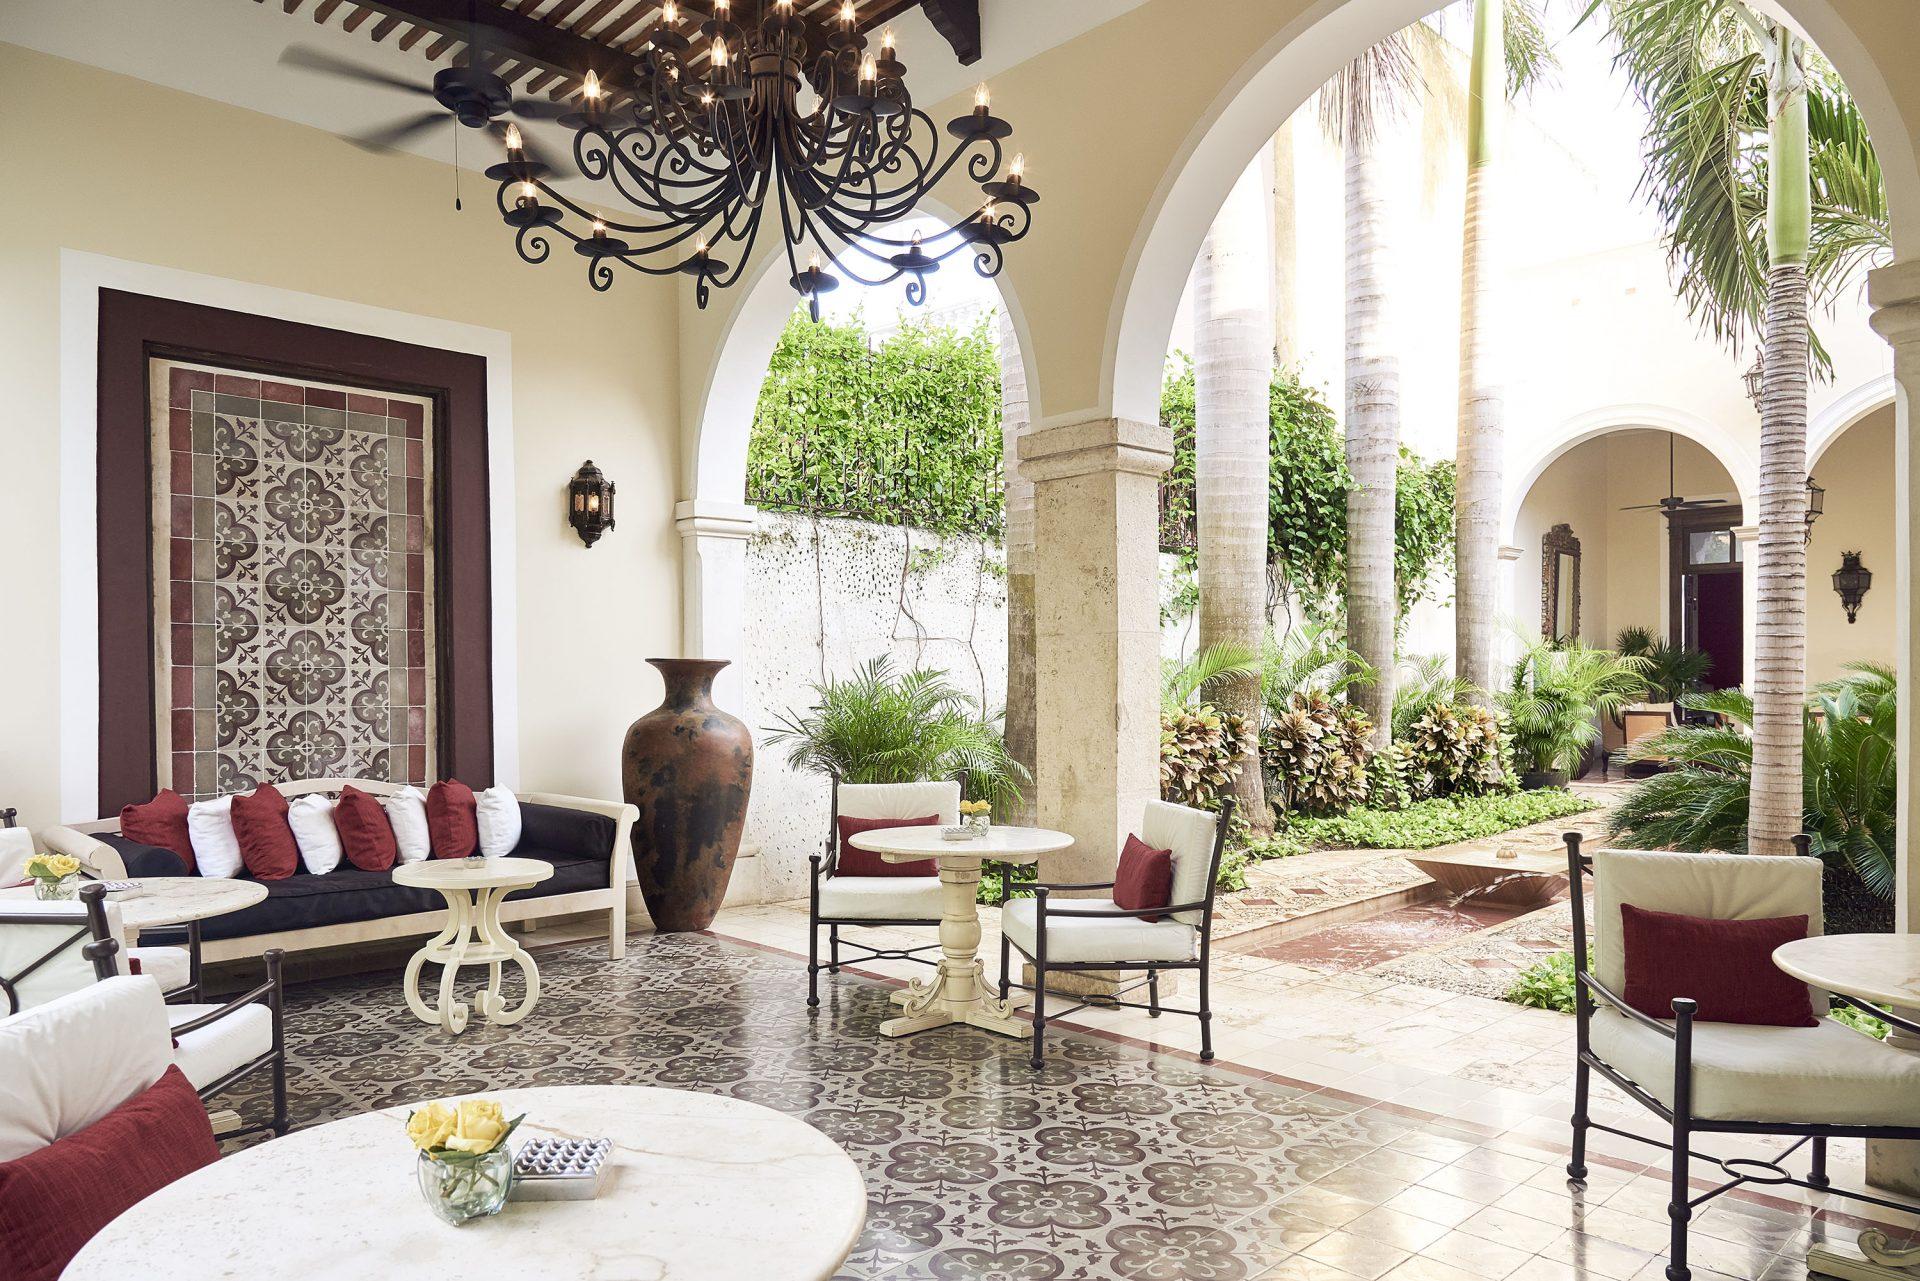 Casa Lecanda Boutique Hotel, de exuberante belleza